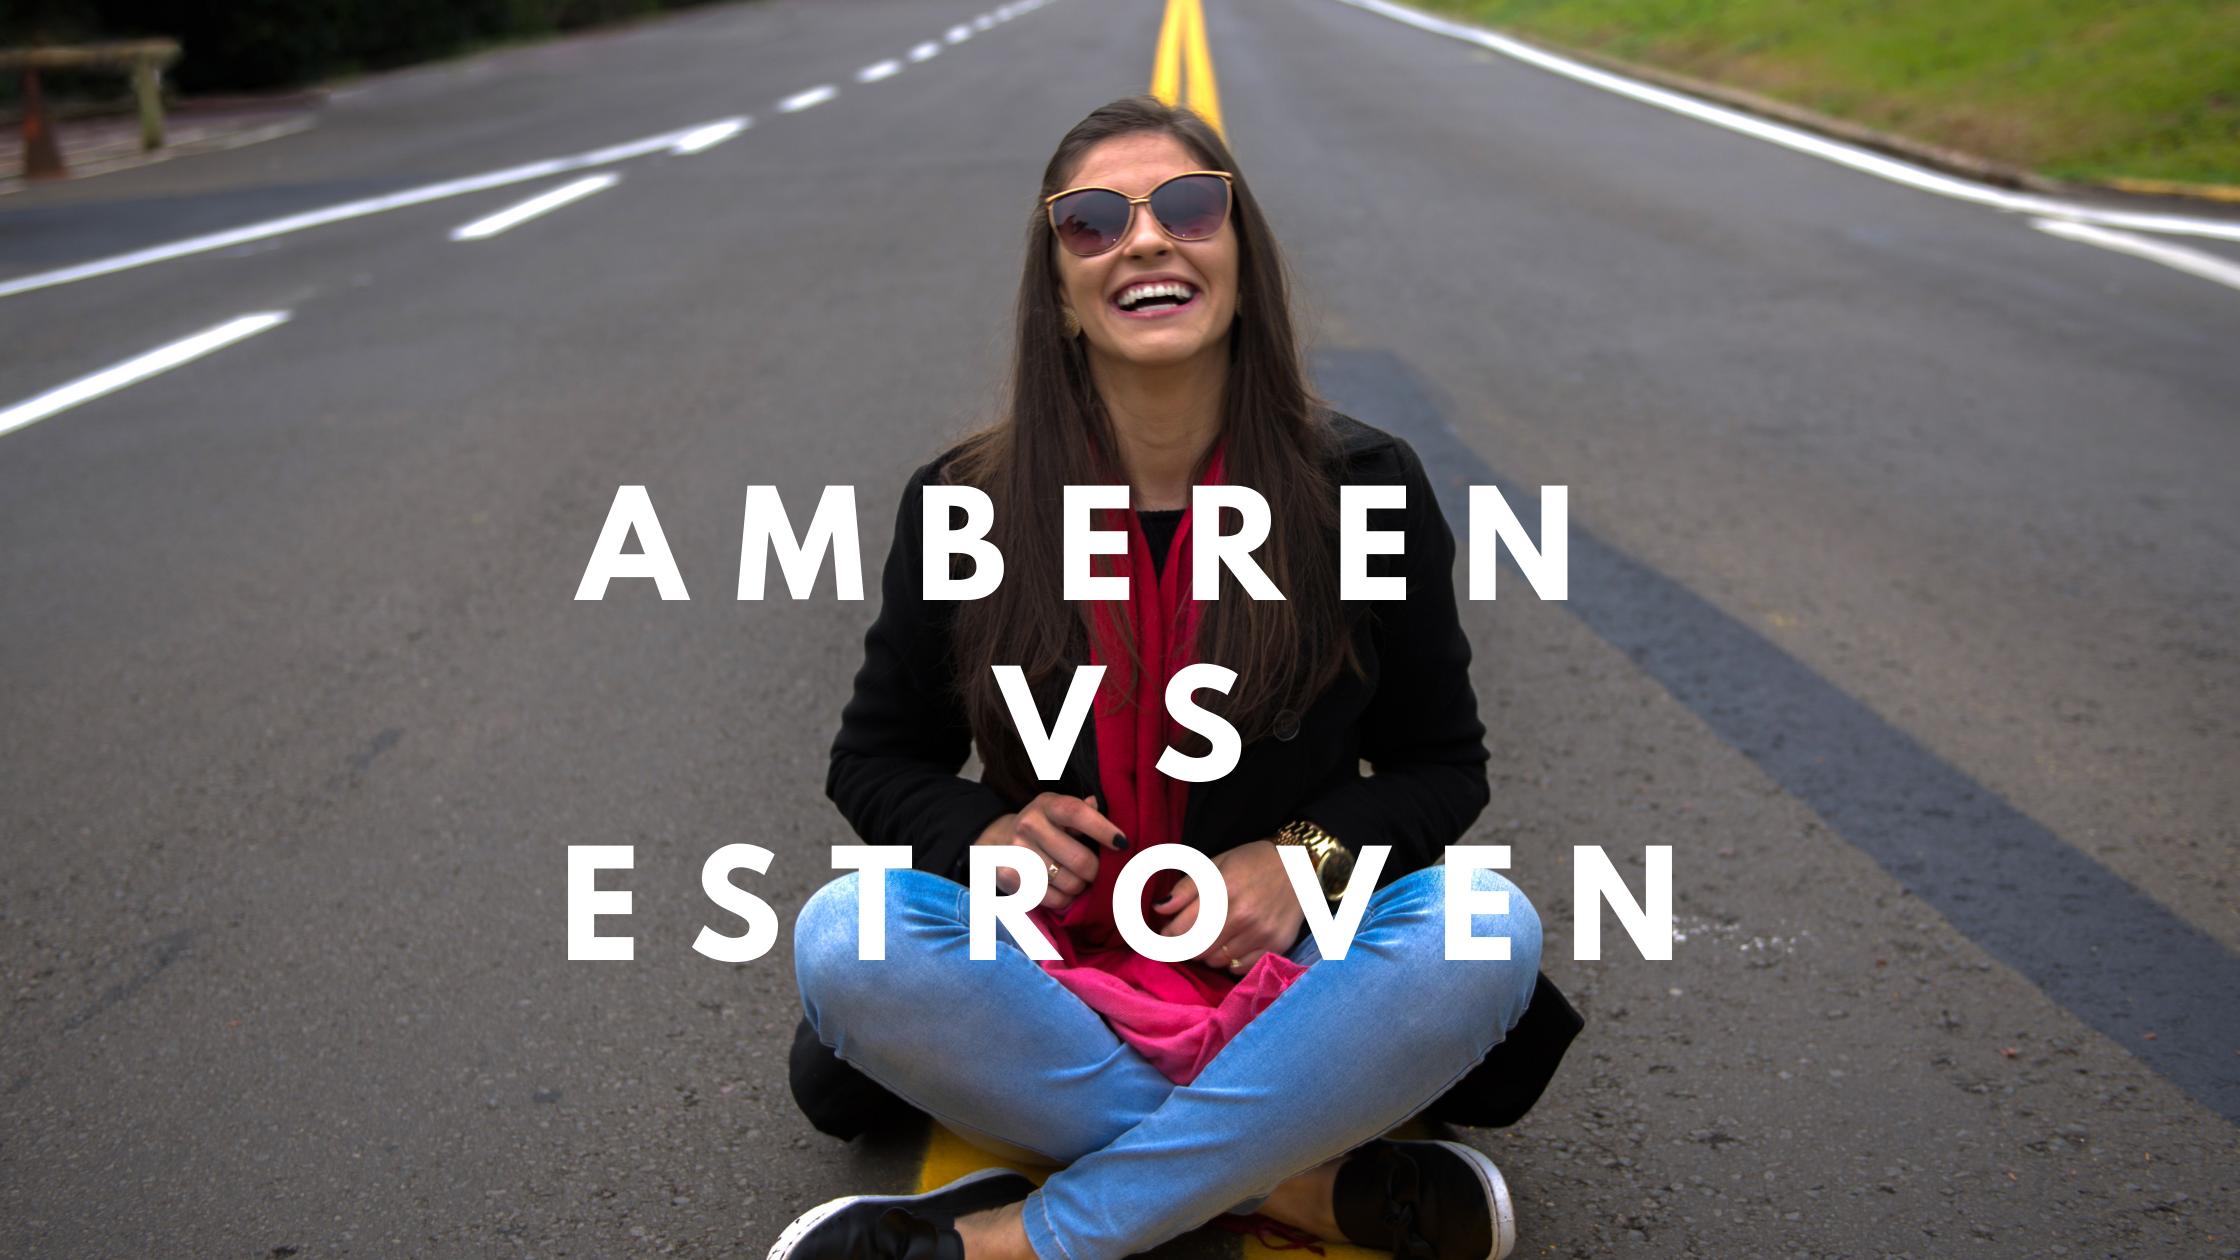 Amberen vs Estroven